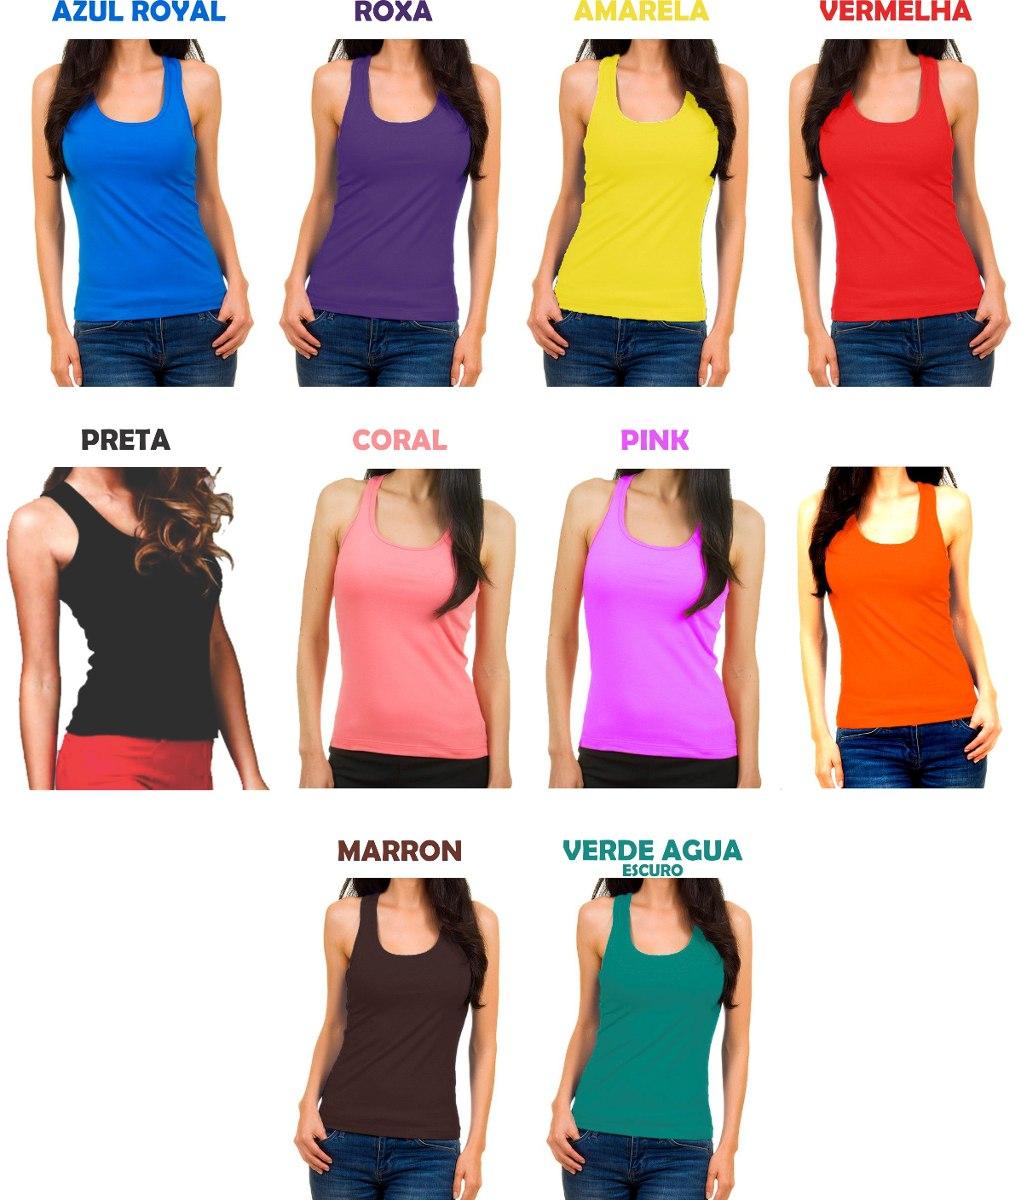 1299ff547 regata feminina nadador academia camiseta blusa viscolycra. Carregando zoom.